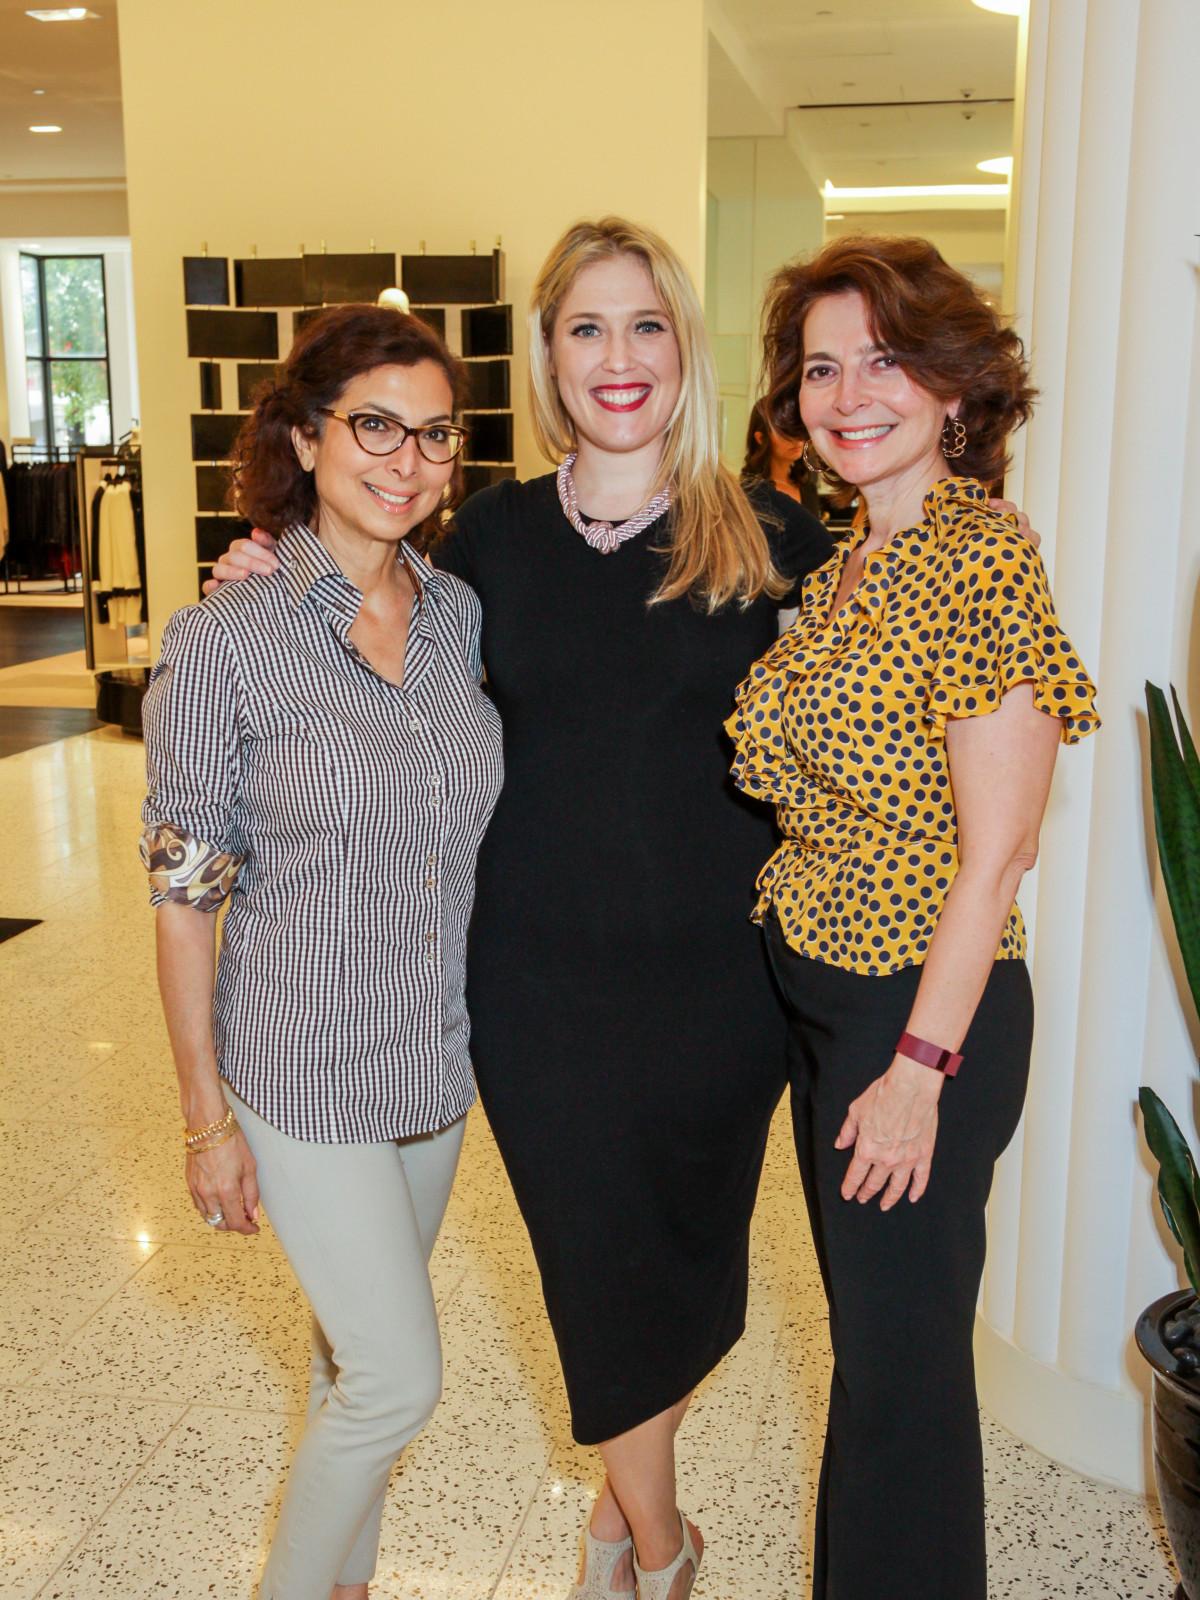 Houston, Ellevate event at Tootsies, August 2015, Shushana Castle, Jennifer Roosth, Lidya Osadchey